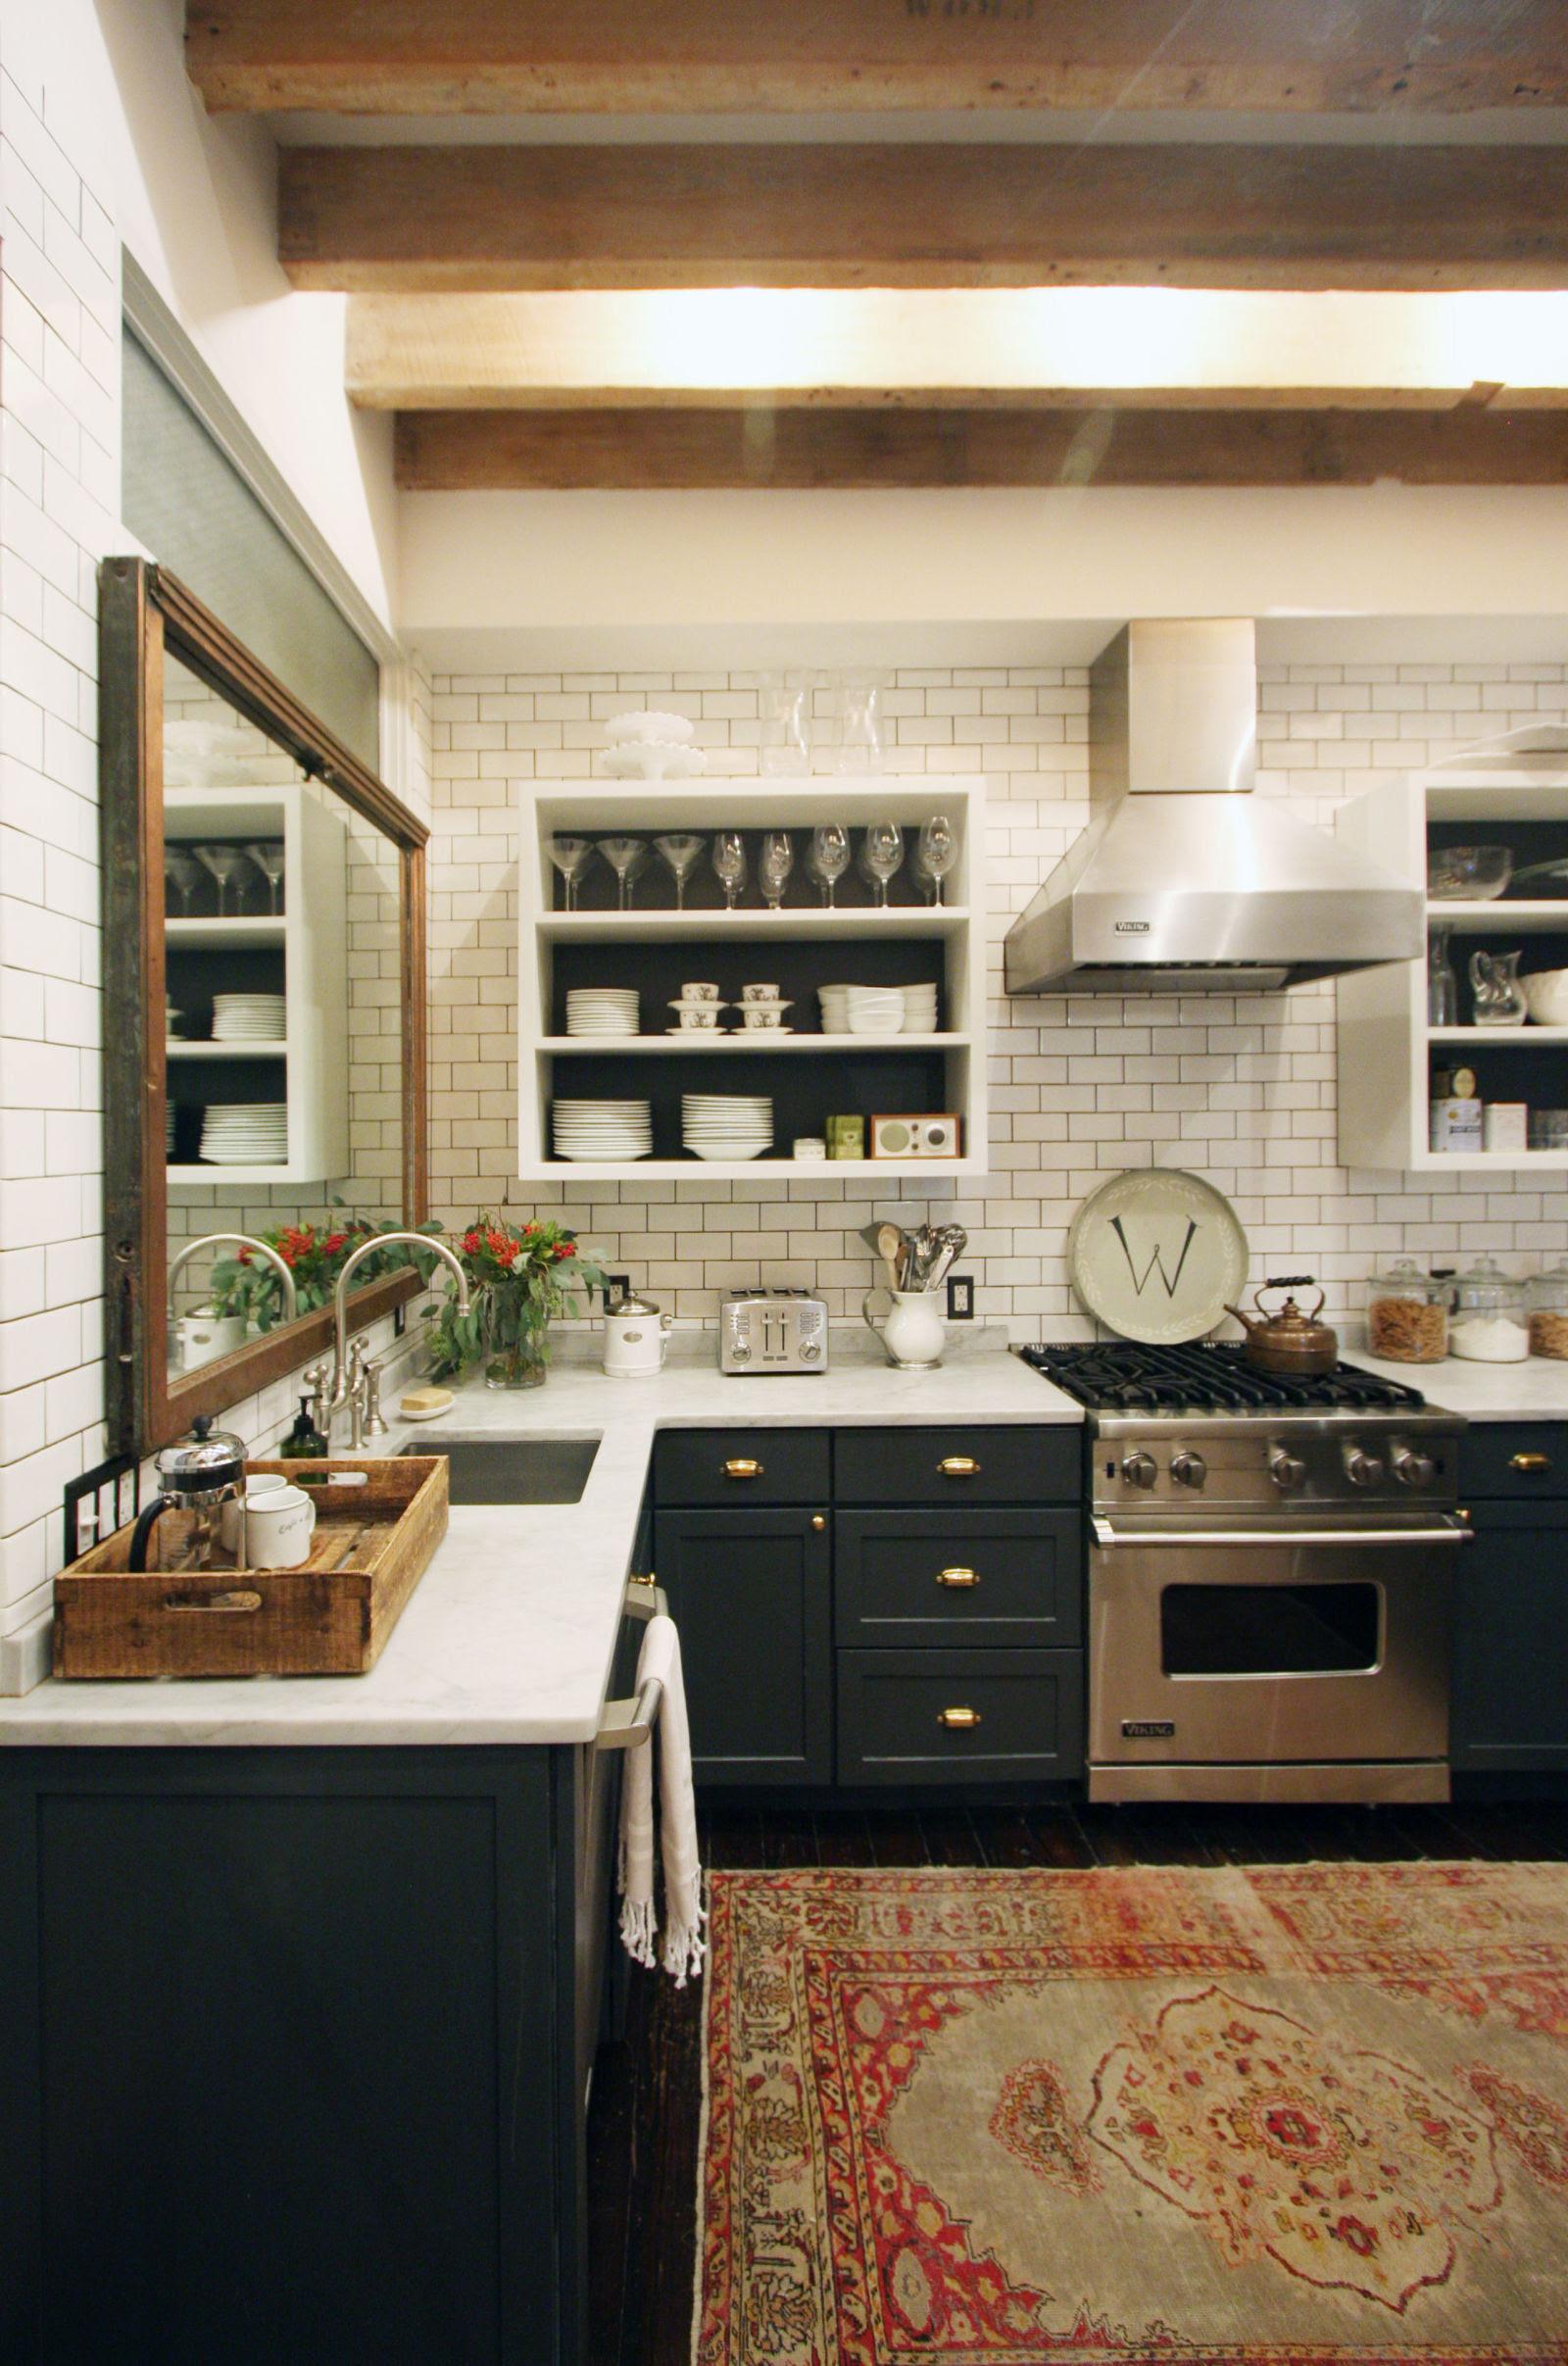 Kitchen Design Trends that Will Dominate in 2017